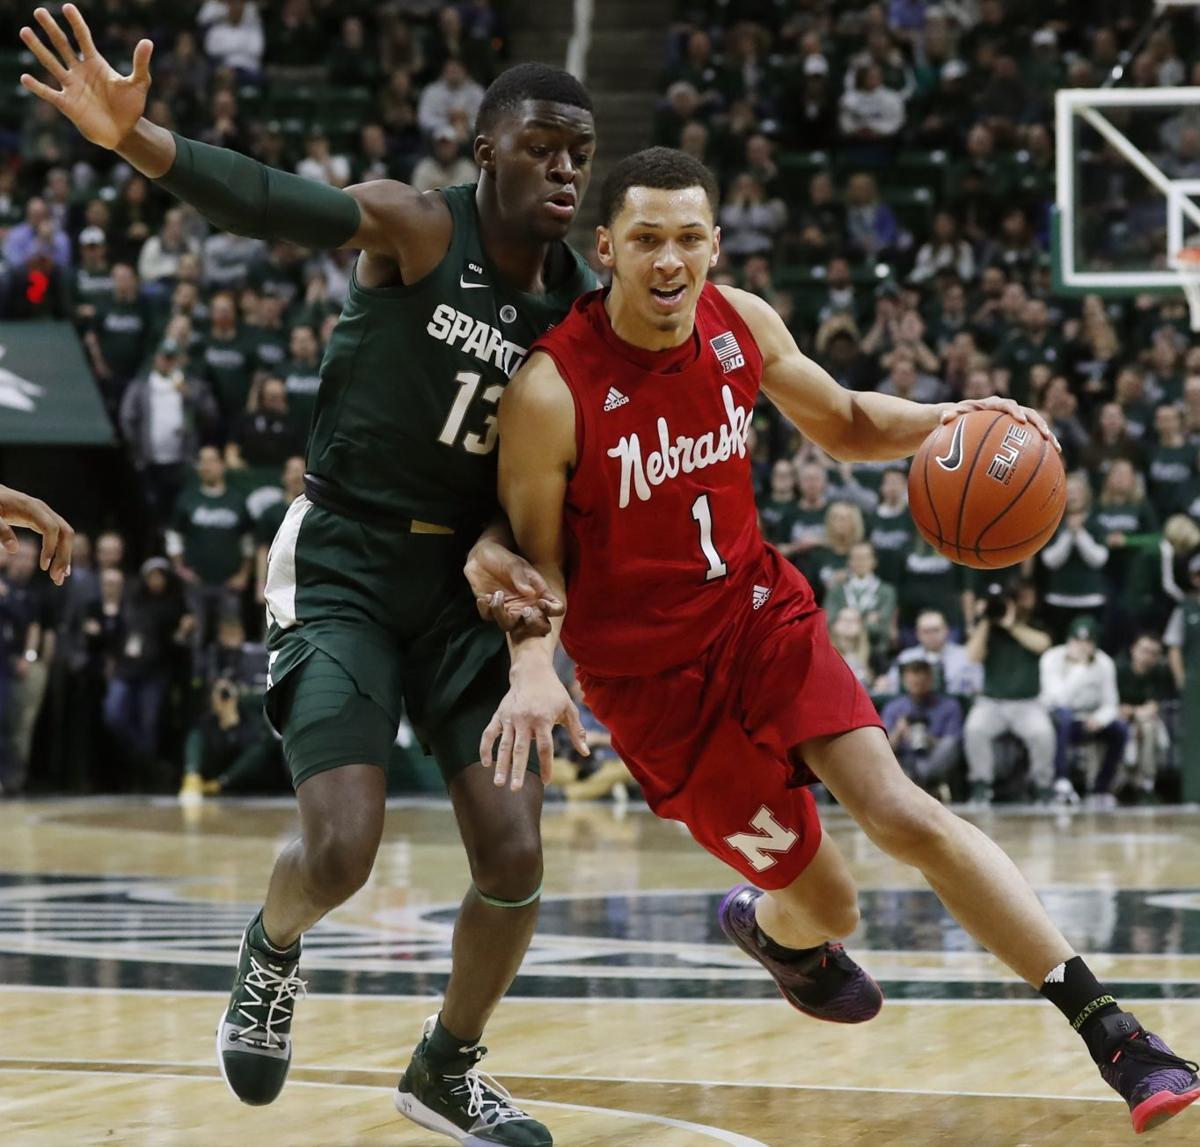 Nebraska Michigan St Basketball